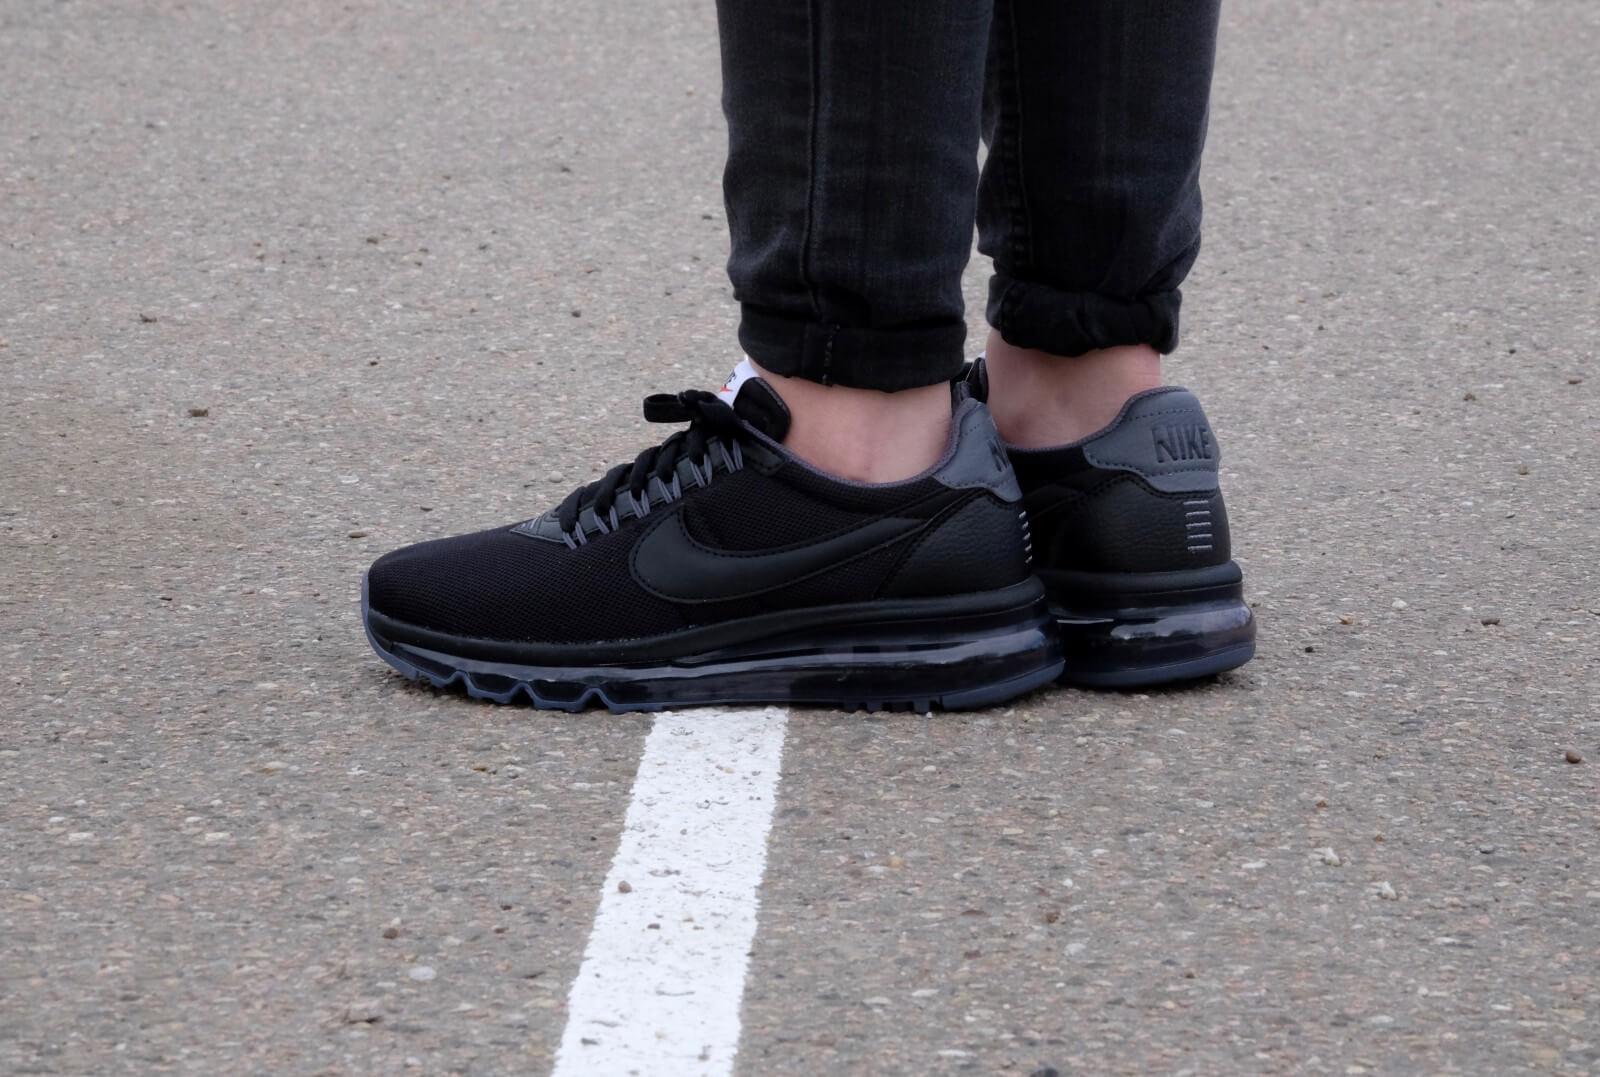 Nike WMNS Air Max LD Zero BlackDark Grey 896495 002